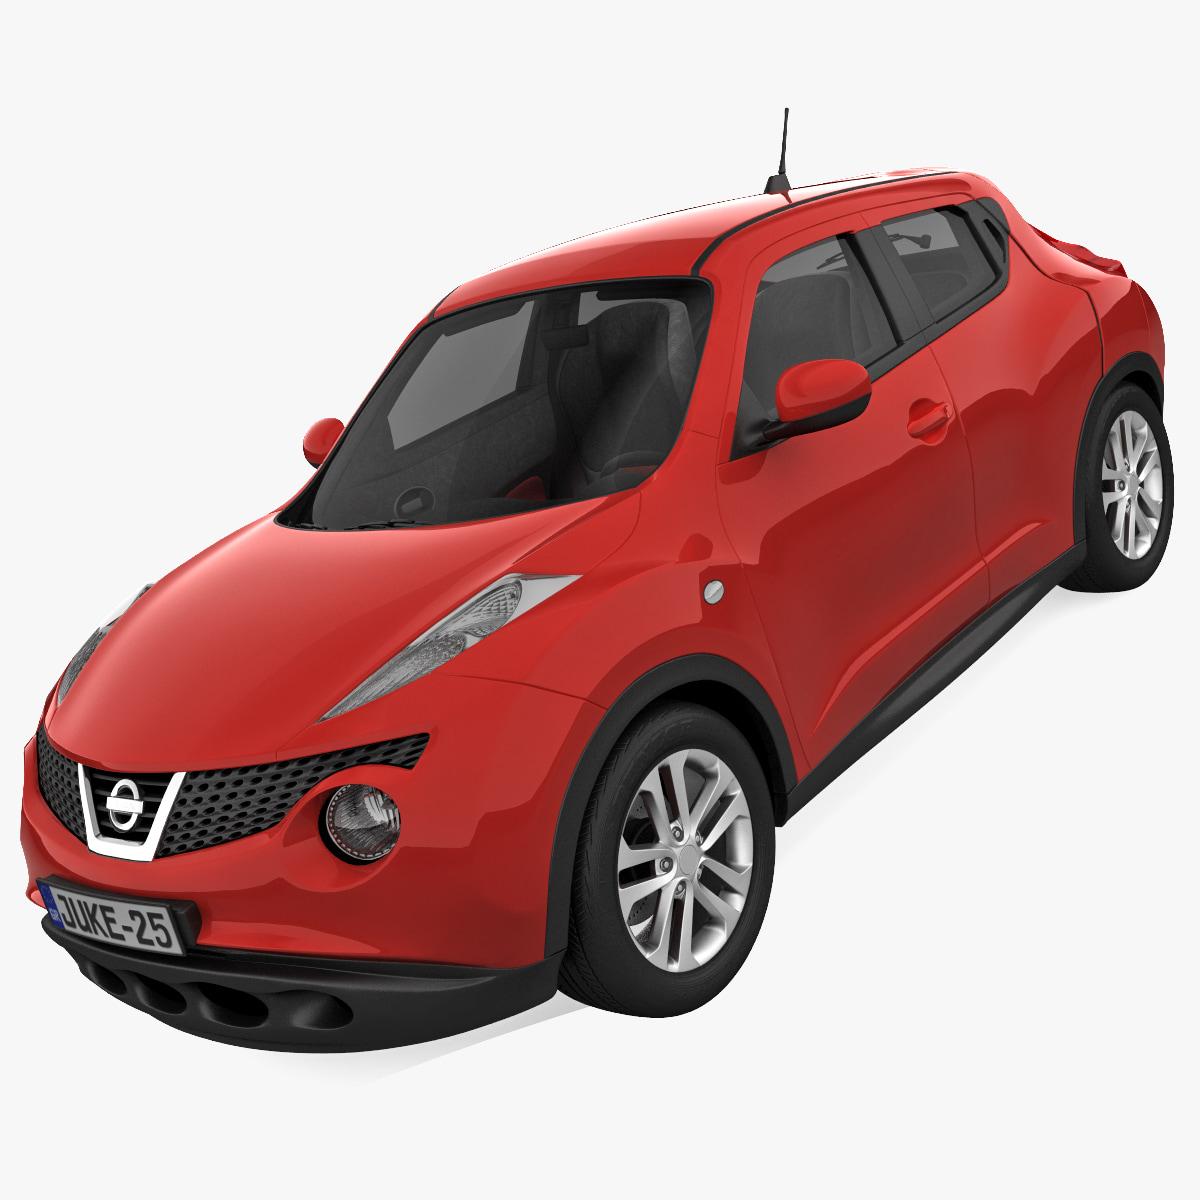 Nissan_Juke_00.jpg